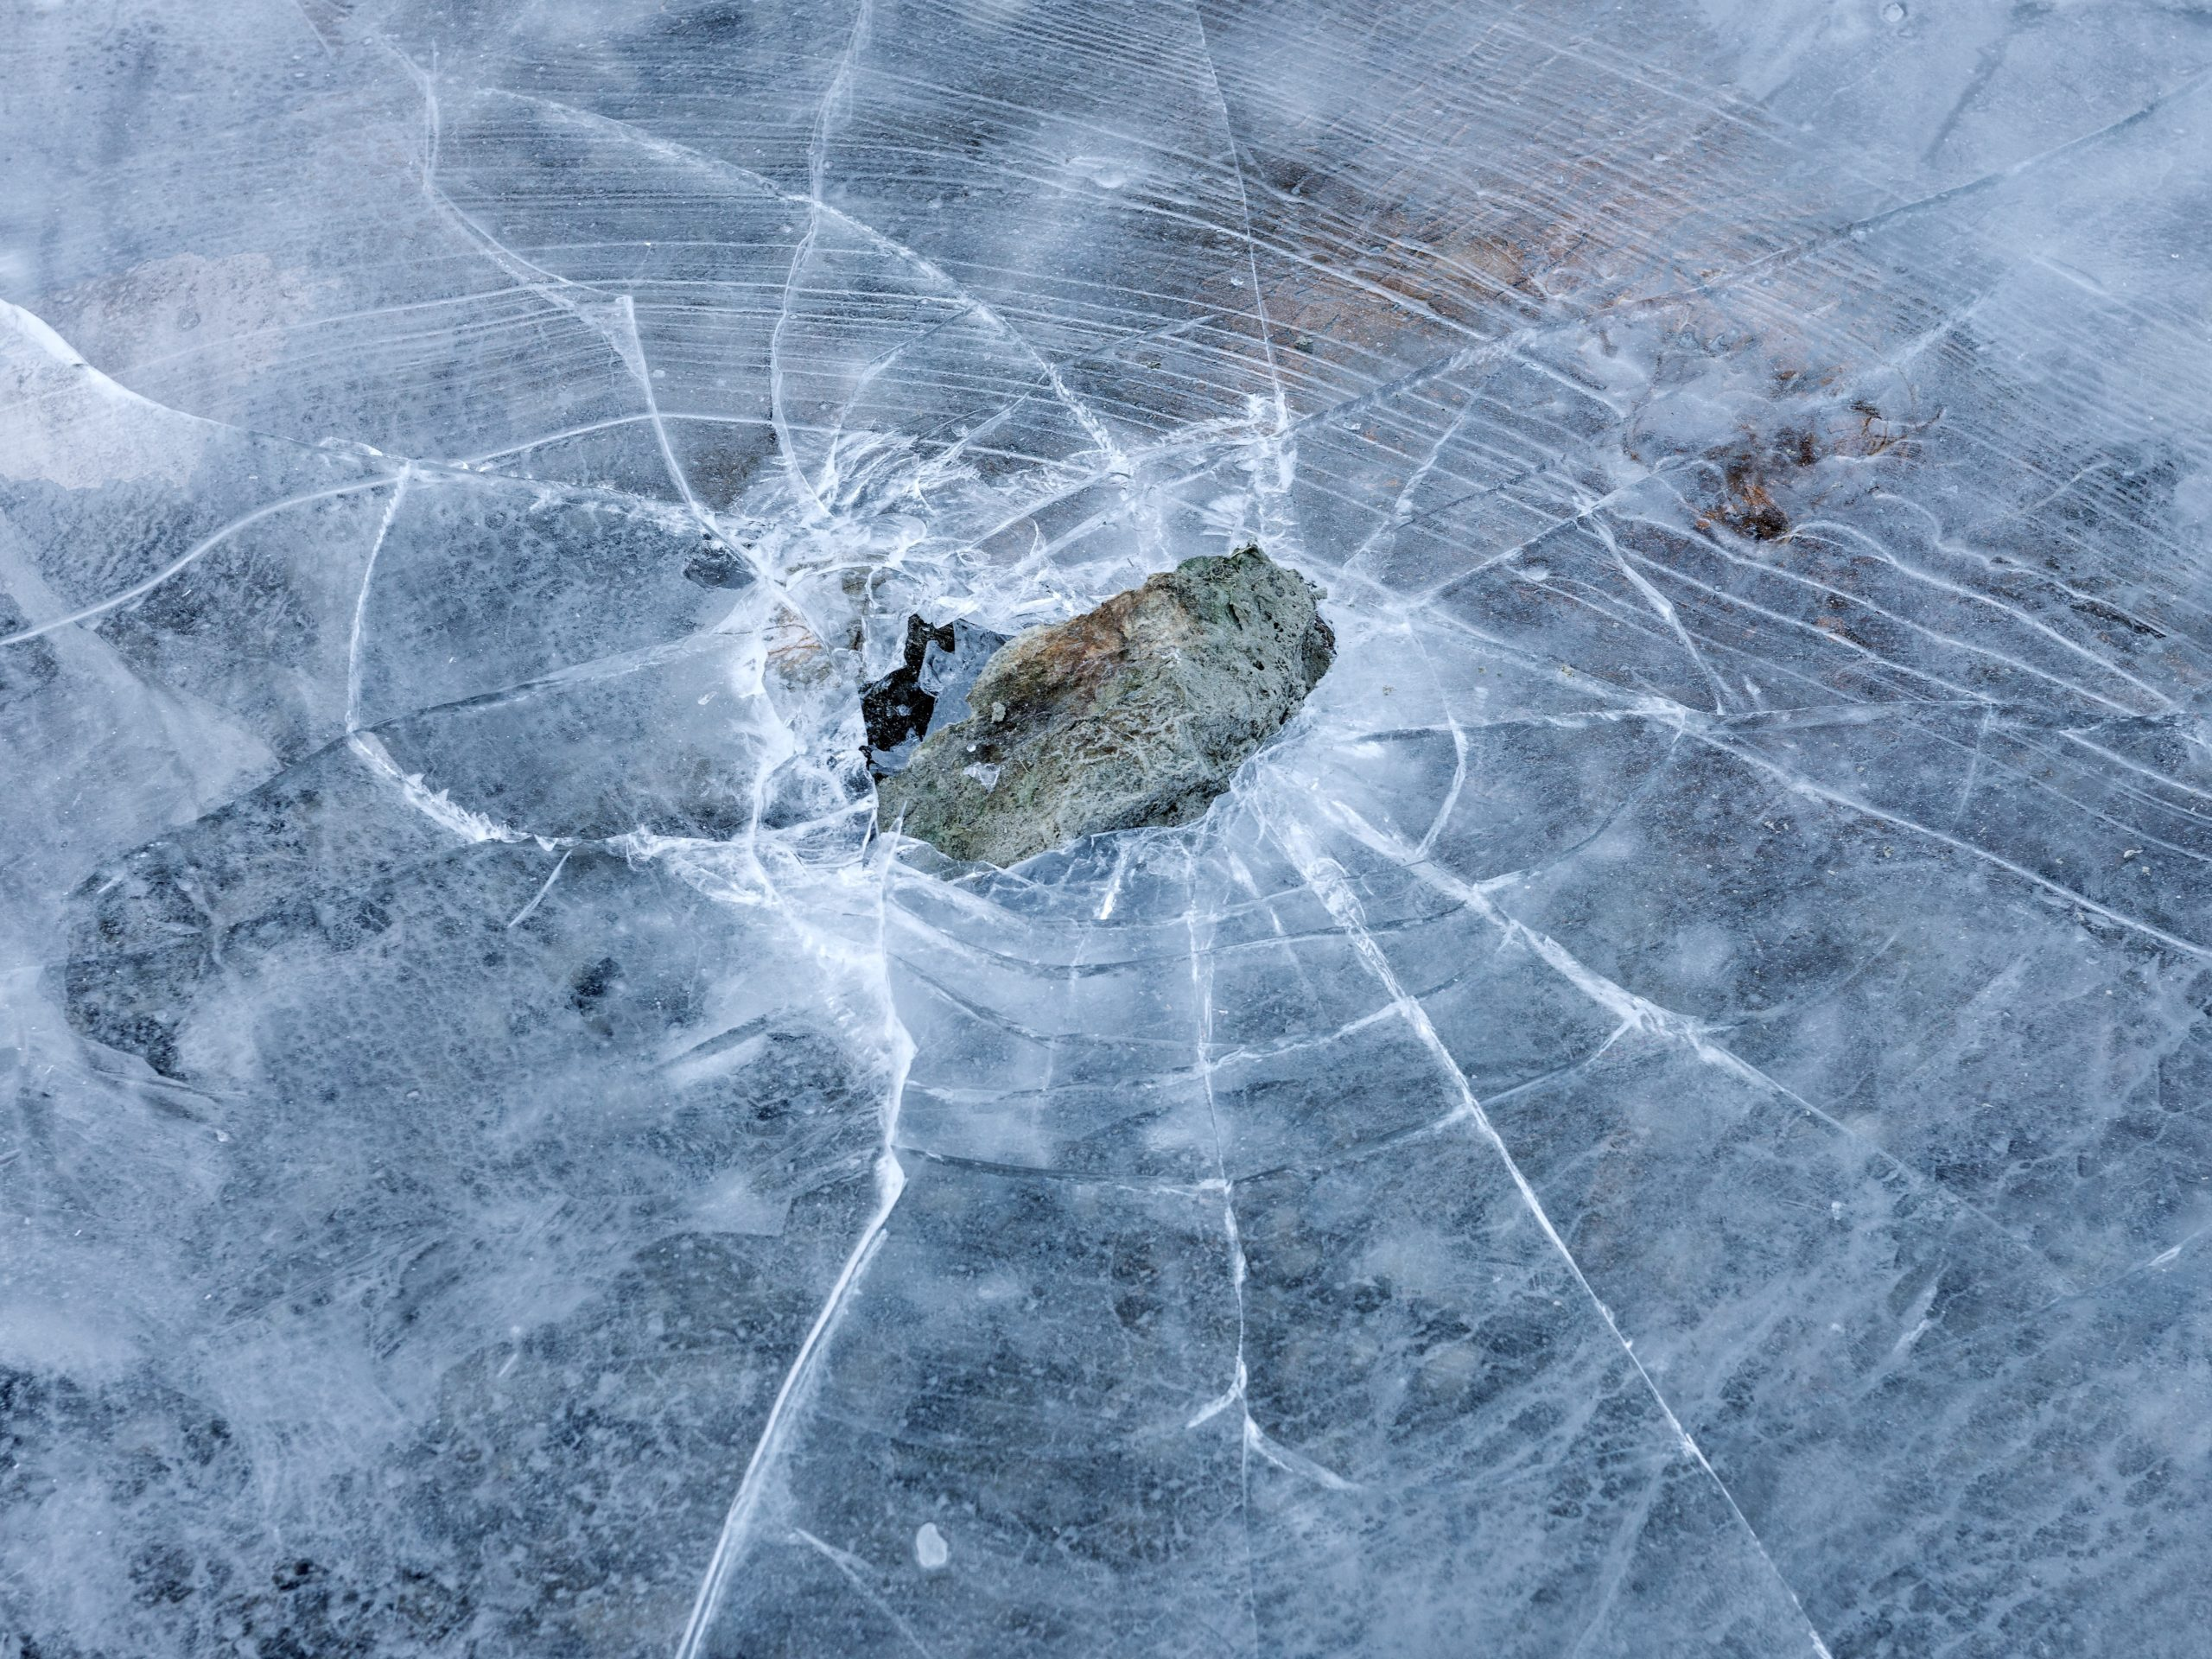 Rock under cracked ice